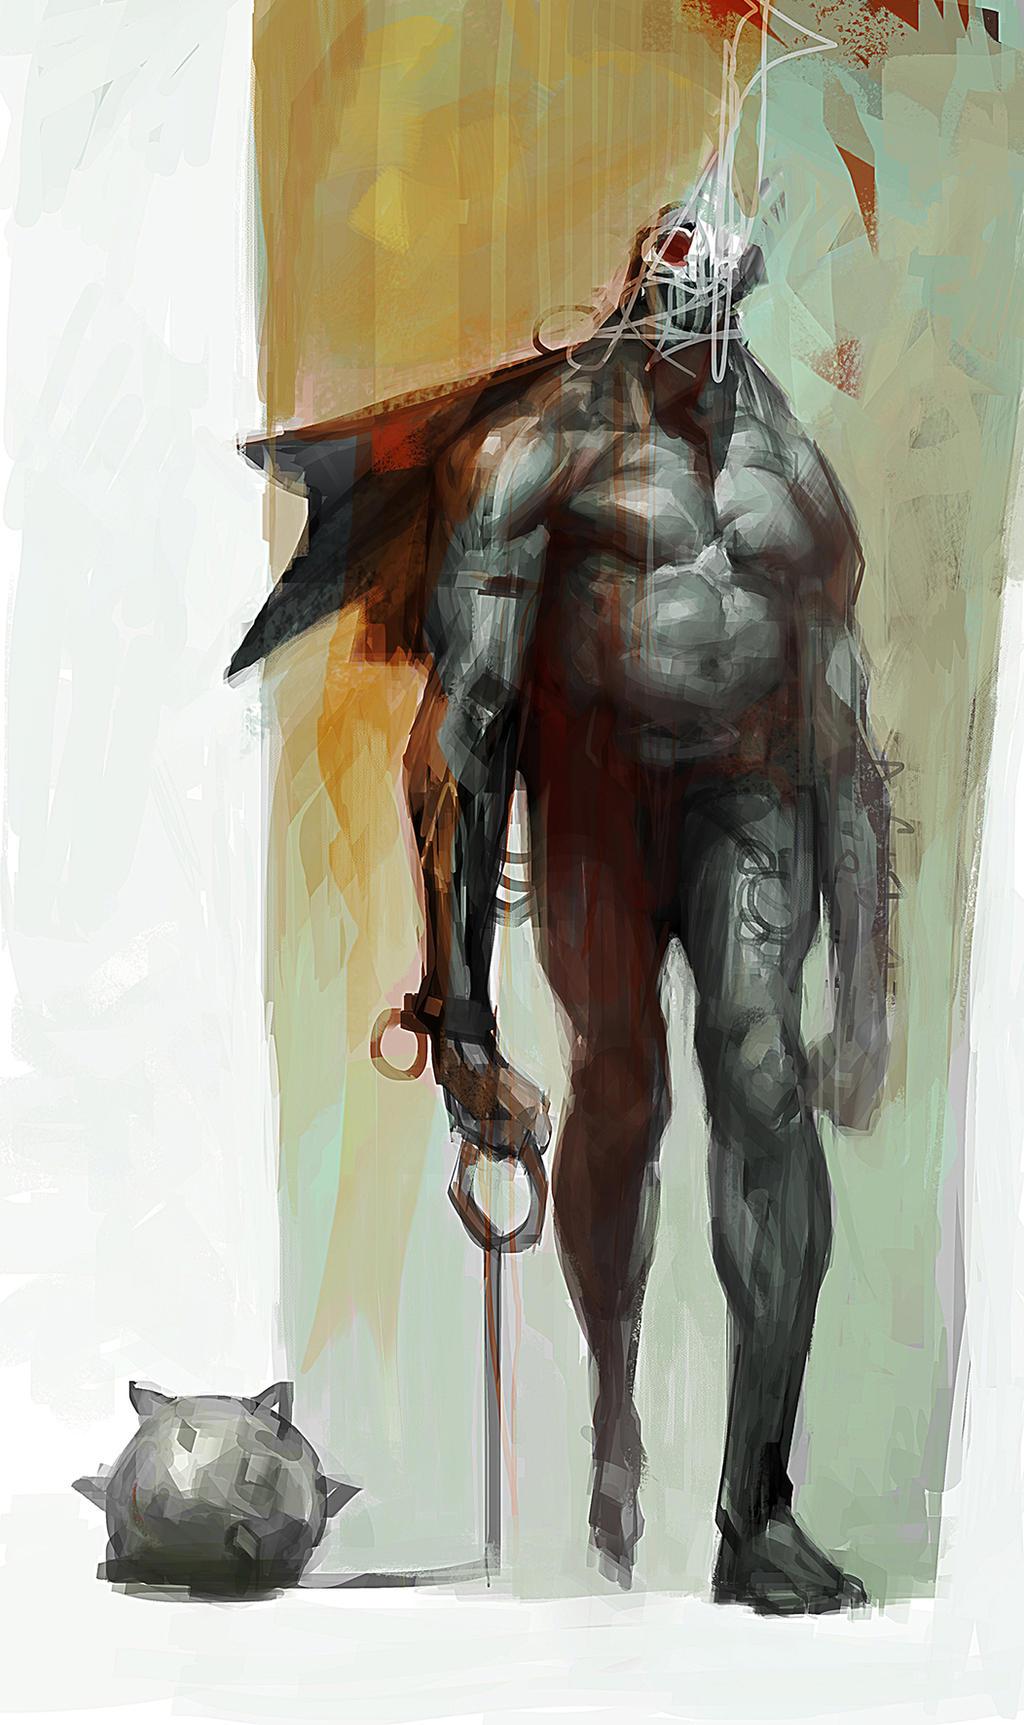 Final2 by EduardVisan